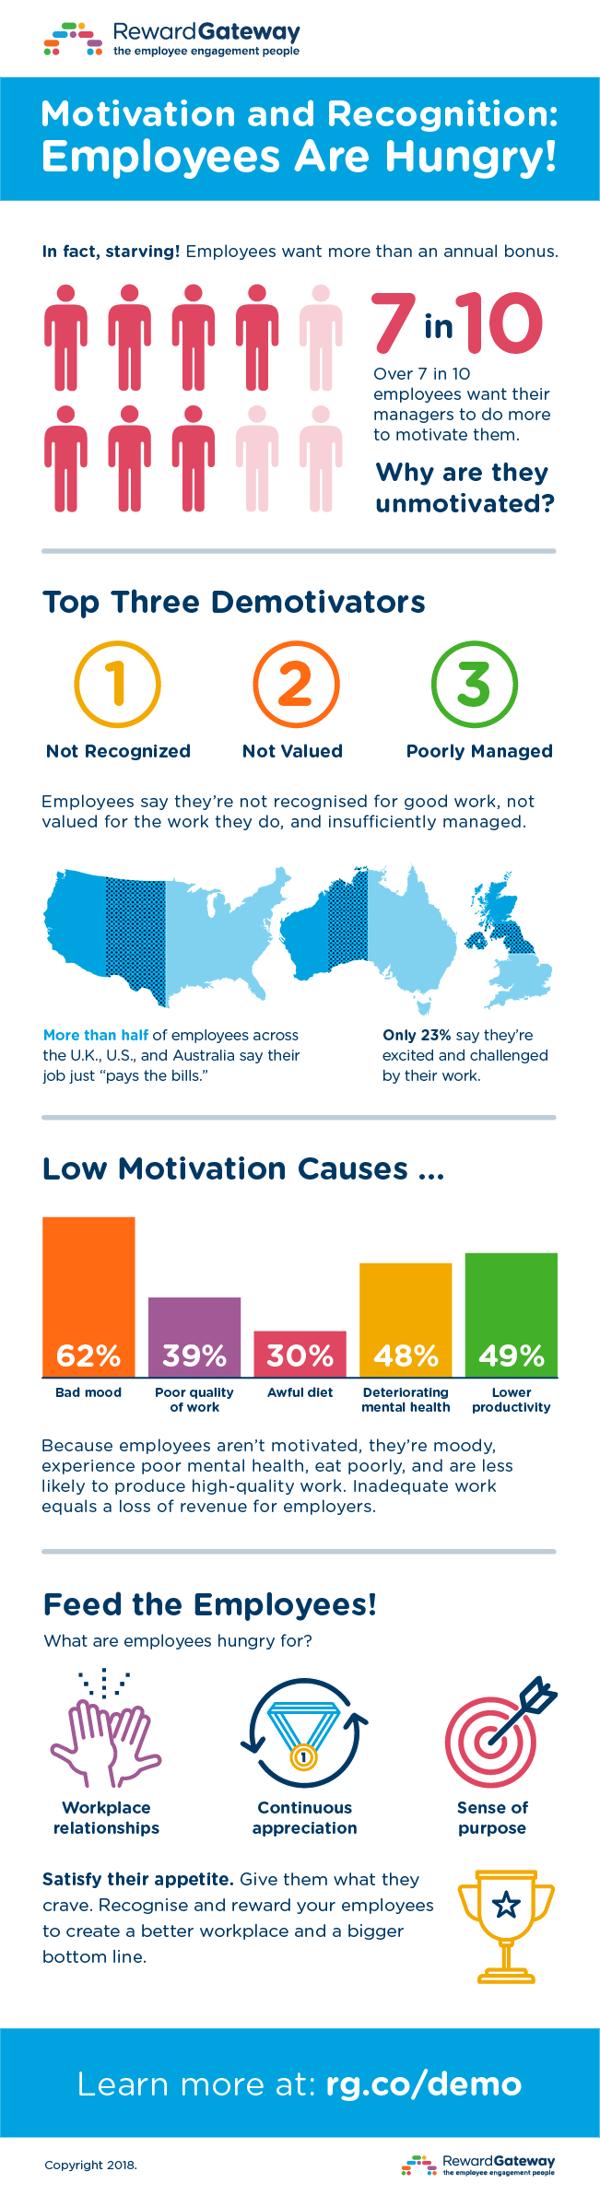 Reward-Gateway-Employee-Motivation-Infographic-2018-UK